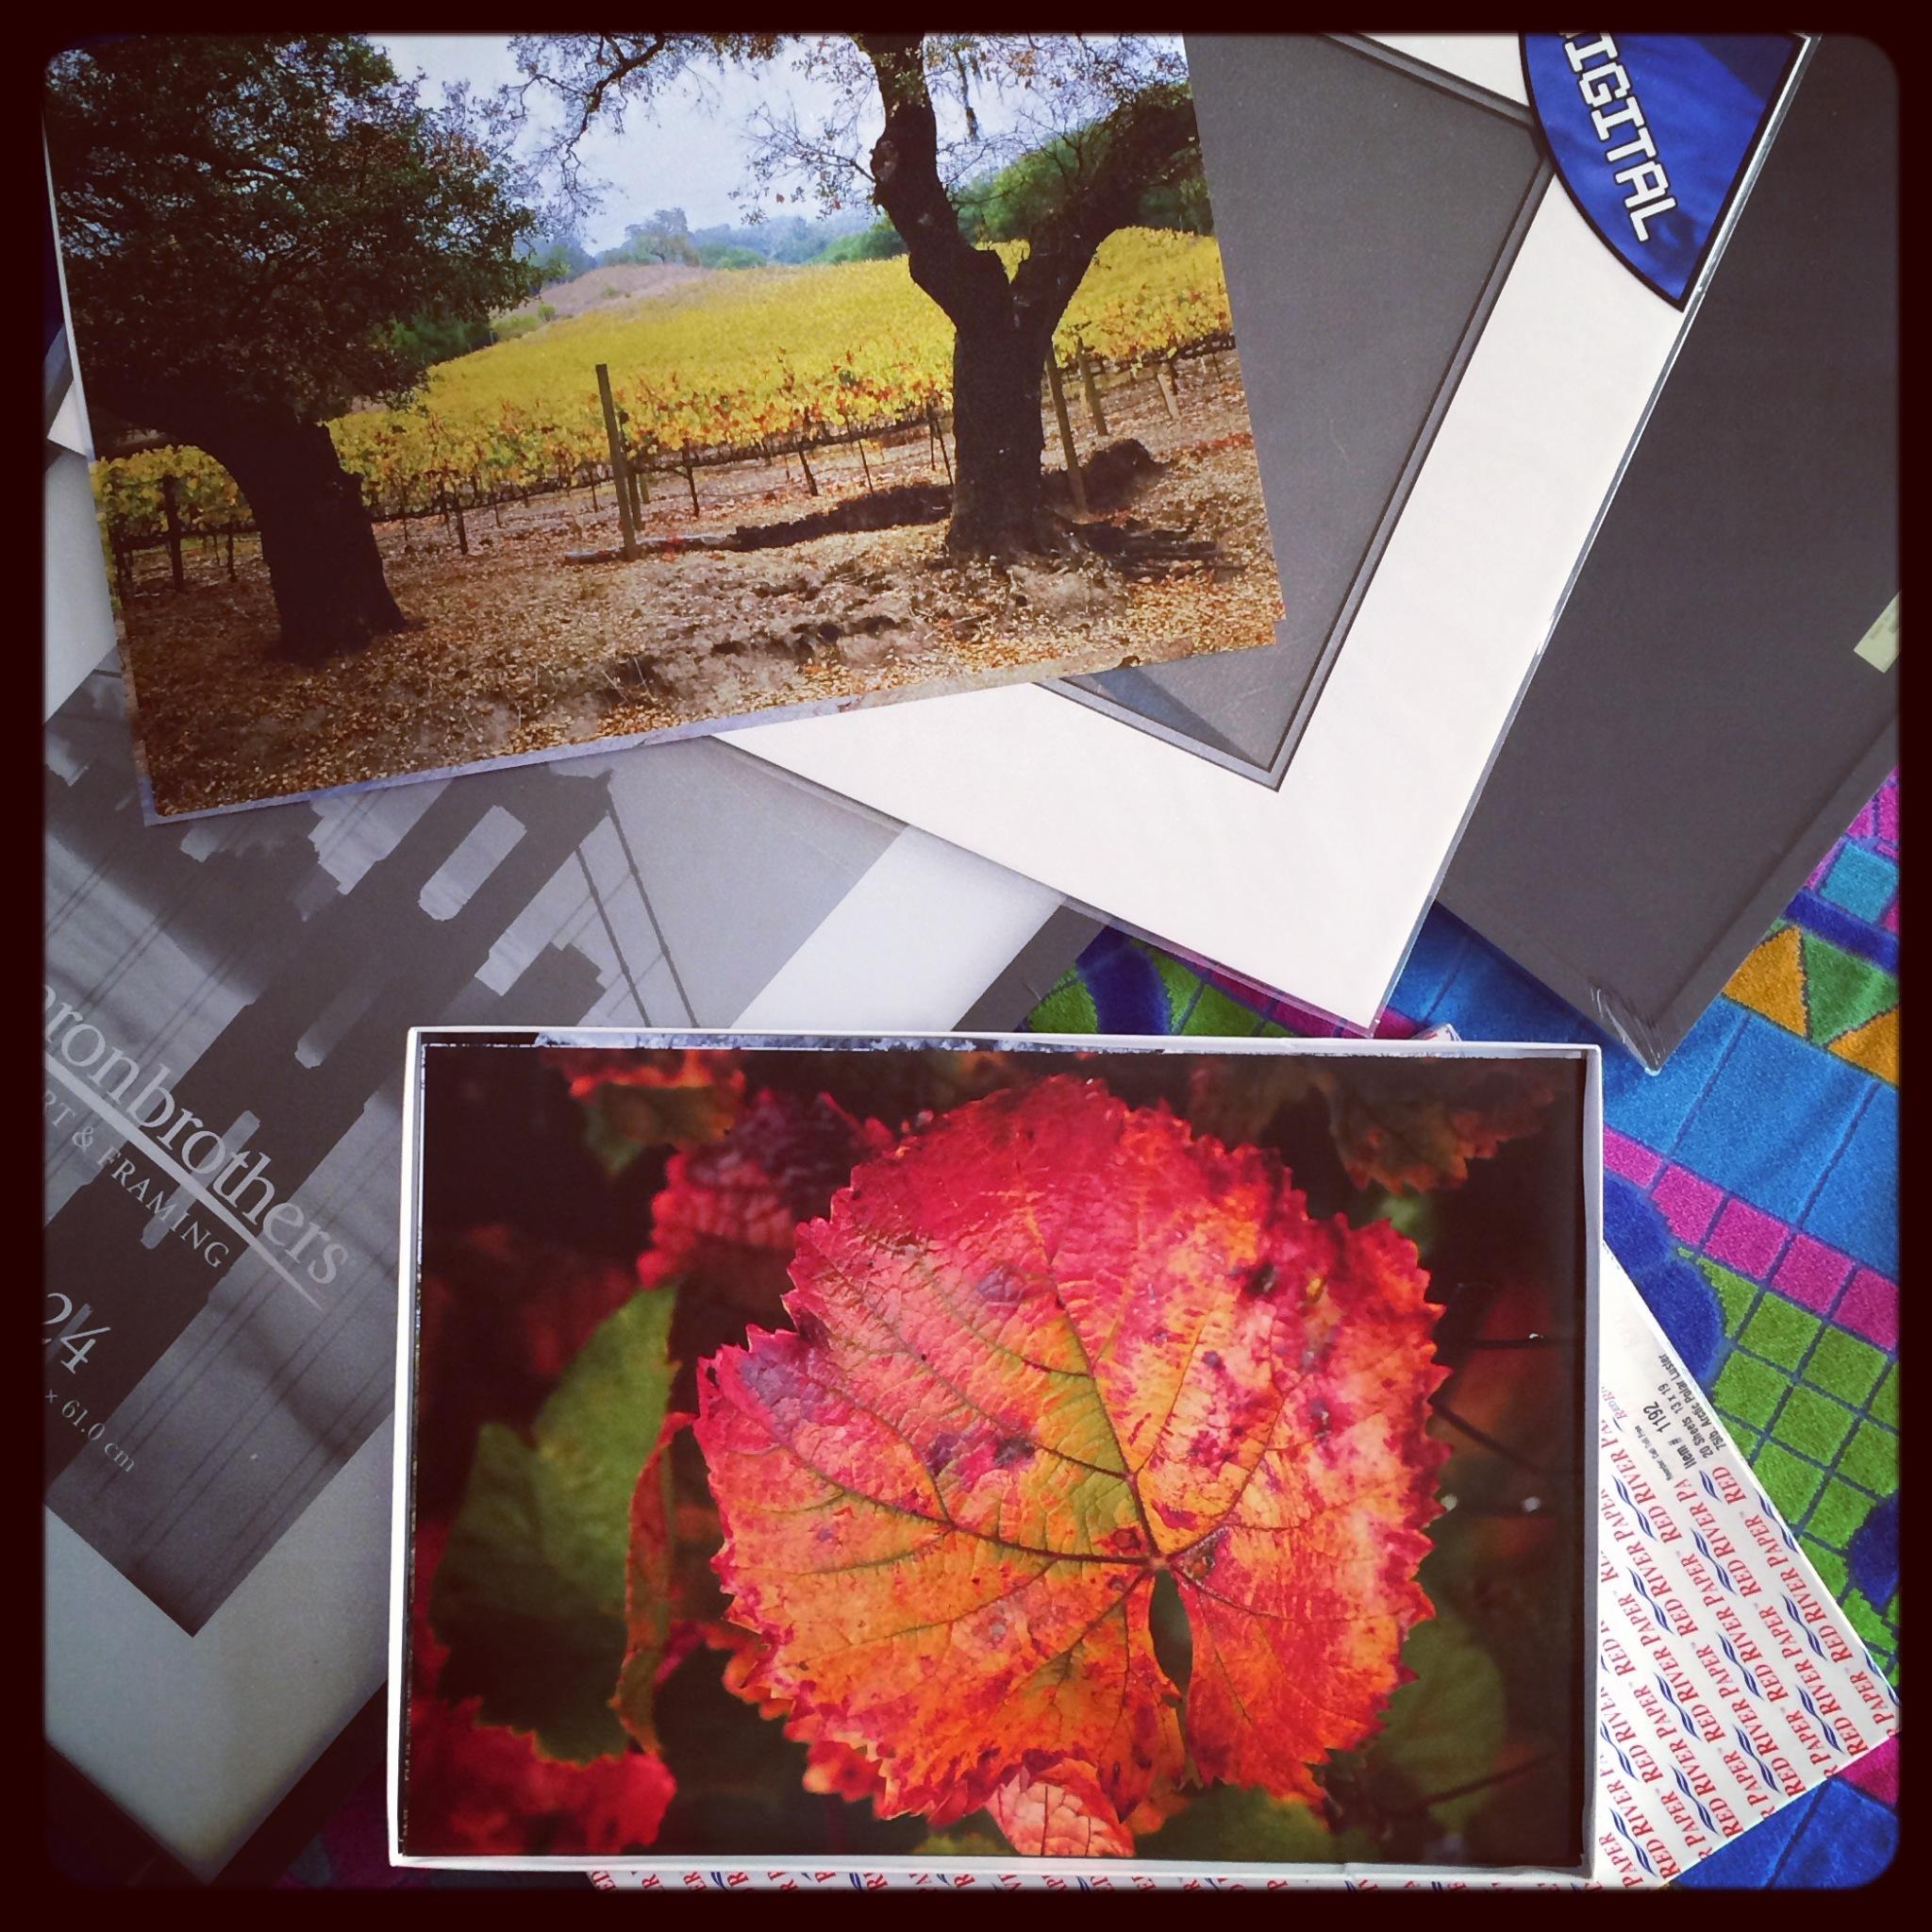 http://thedigitalstory.com/2014/01/05/d-story-framing-prints.jpg